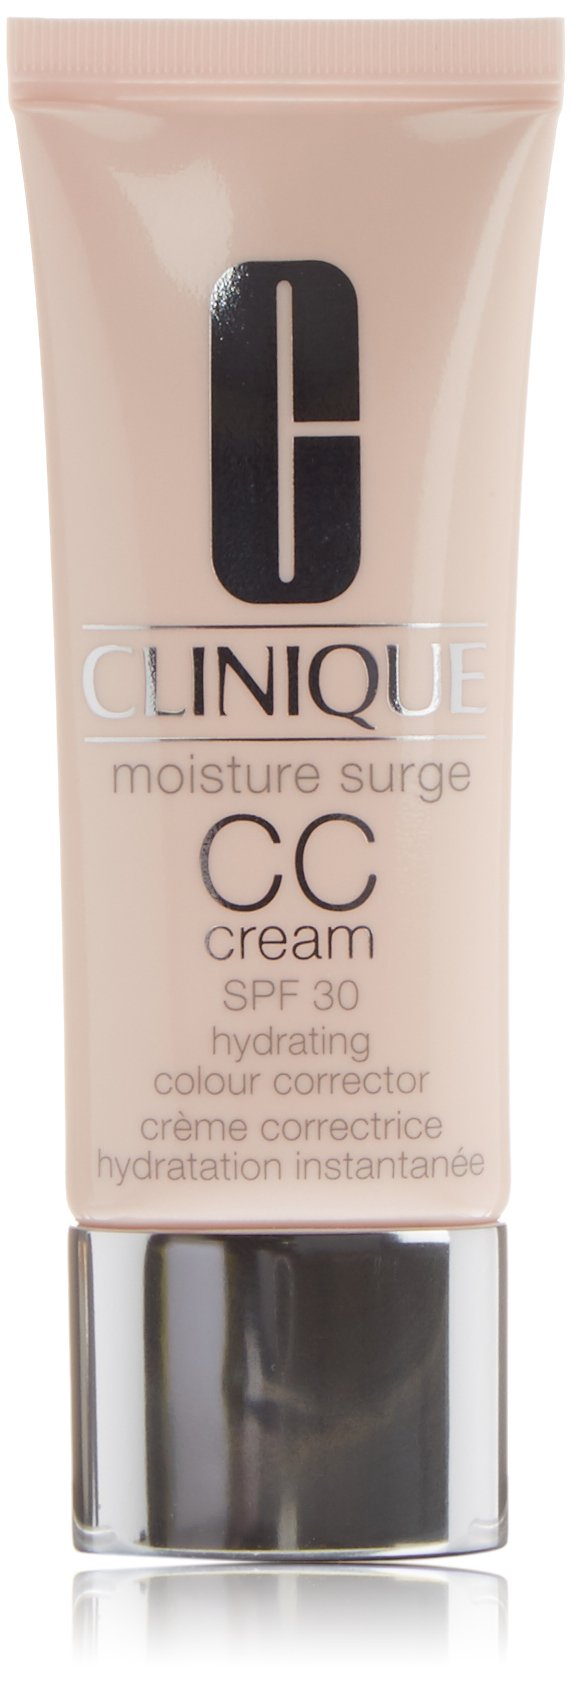 Clinique Moisture Surge All Skin Types CC SPF 30 Hydrating Colour Corrector Cream, light, 1.4 Ounce